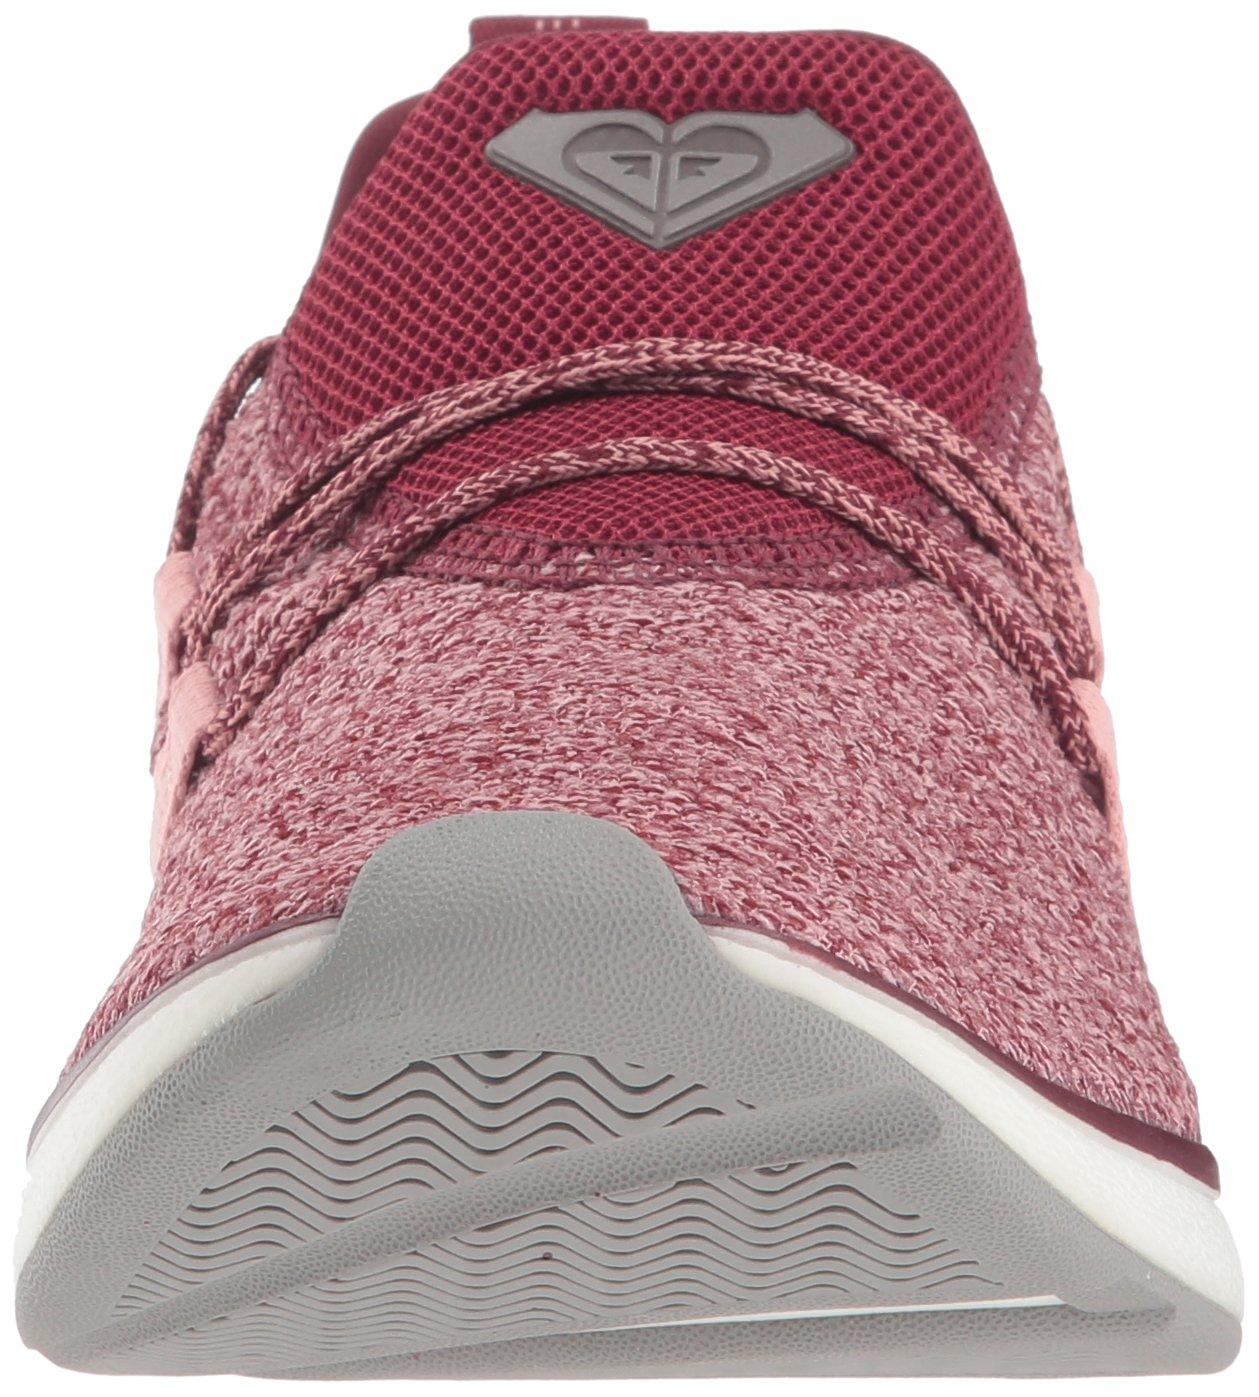 Roxy Women's Set Seeker Athletic Running Shoe B077SP6RDL 10 B(M) US|Burgundy